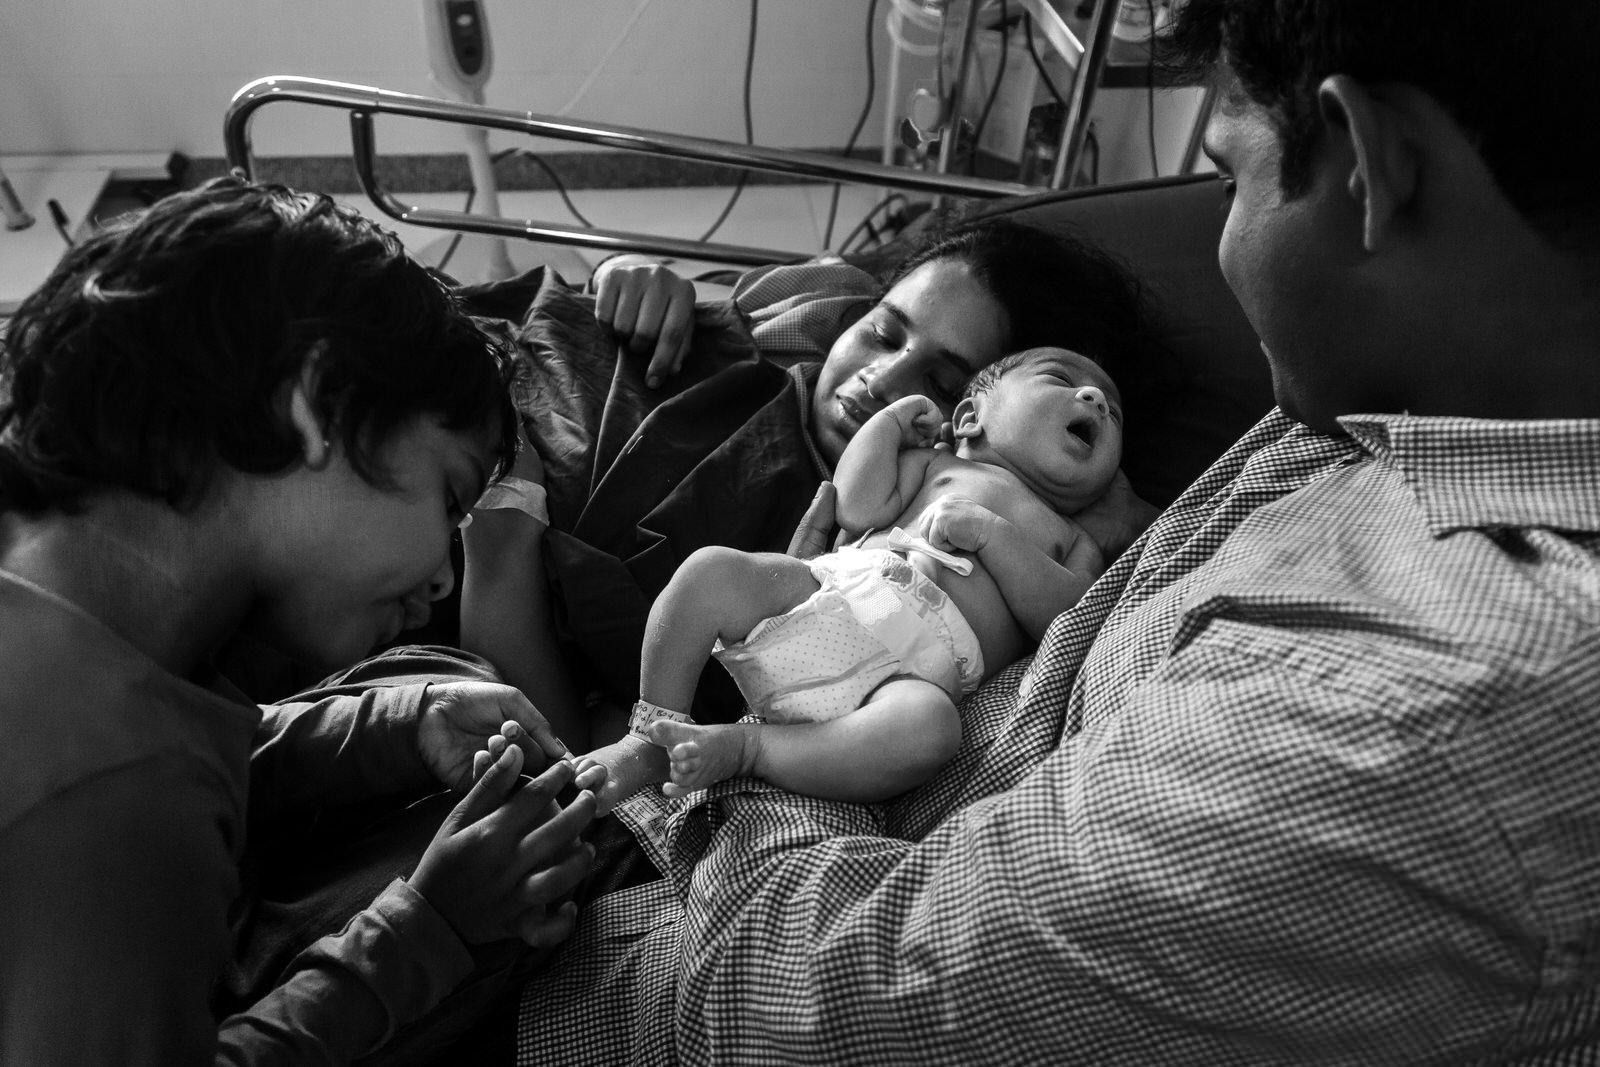 29122015-Arjun-First-Day-Hospital-103.jpg